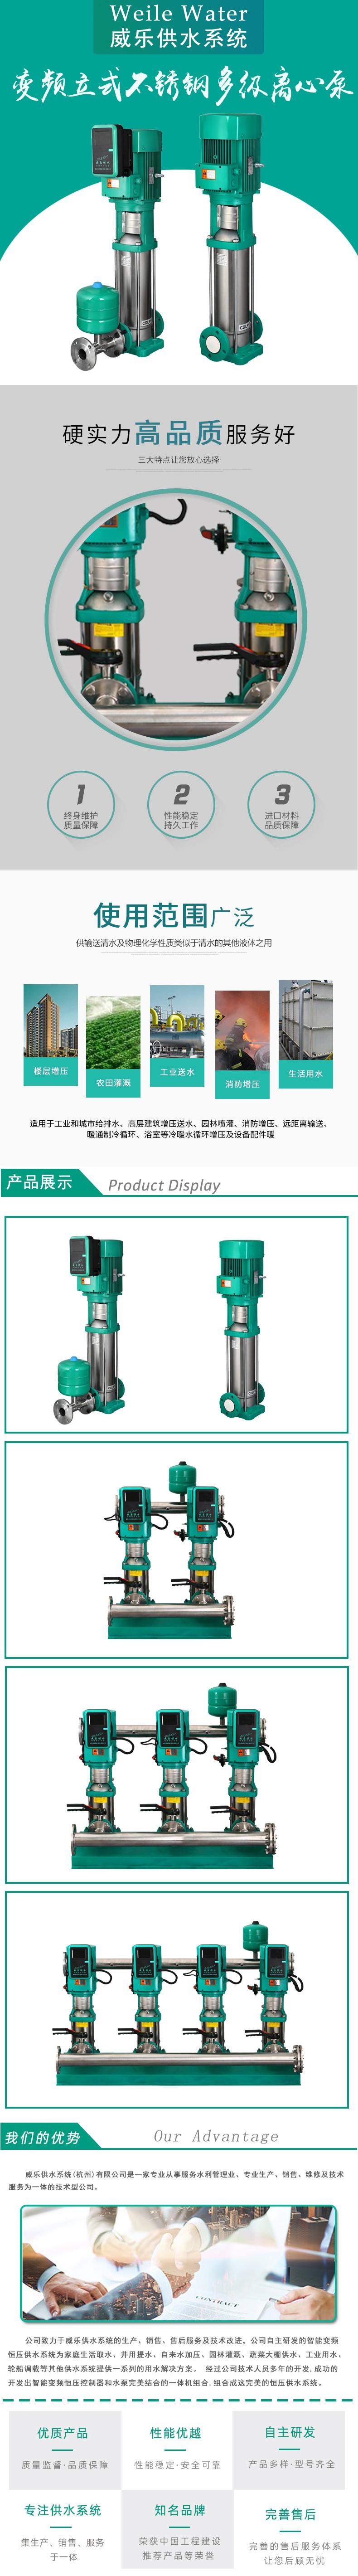 MVLPB不锈钢变频泵